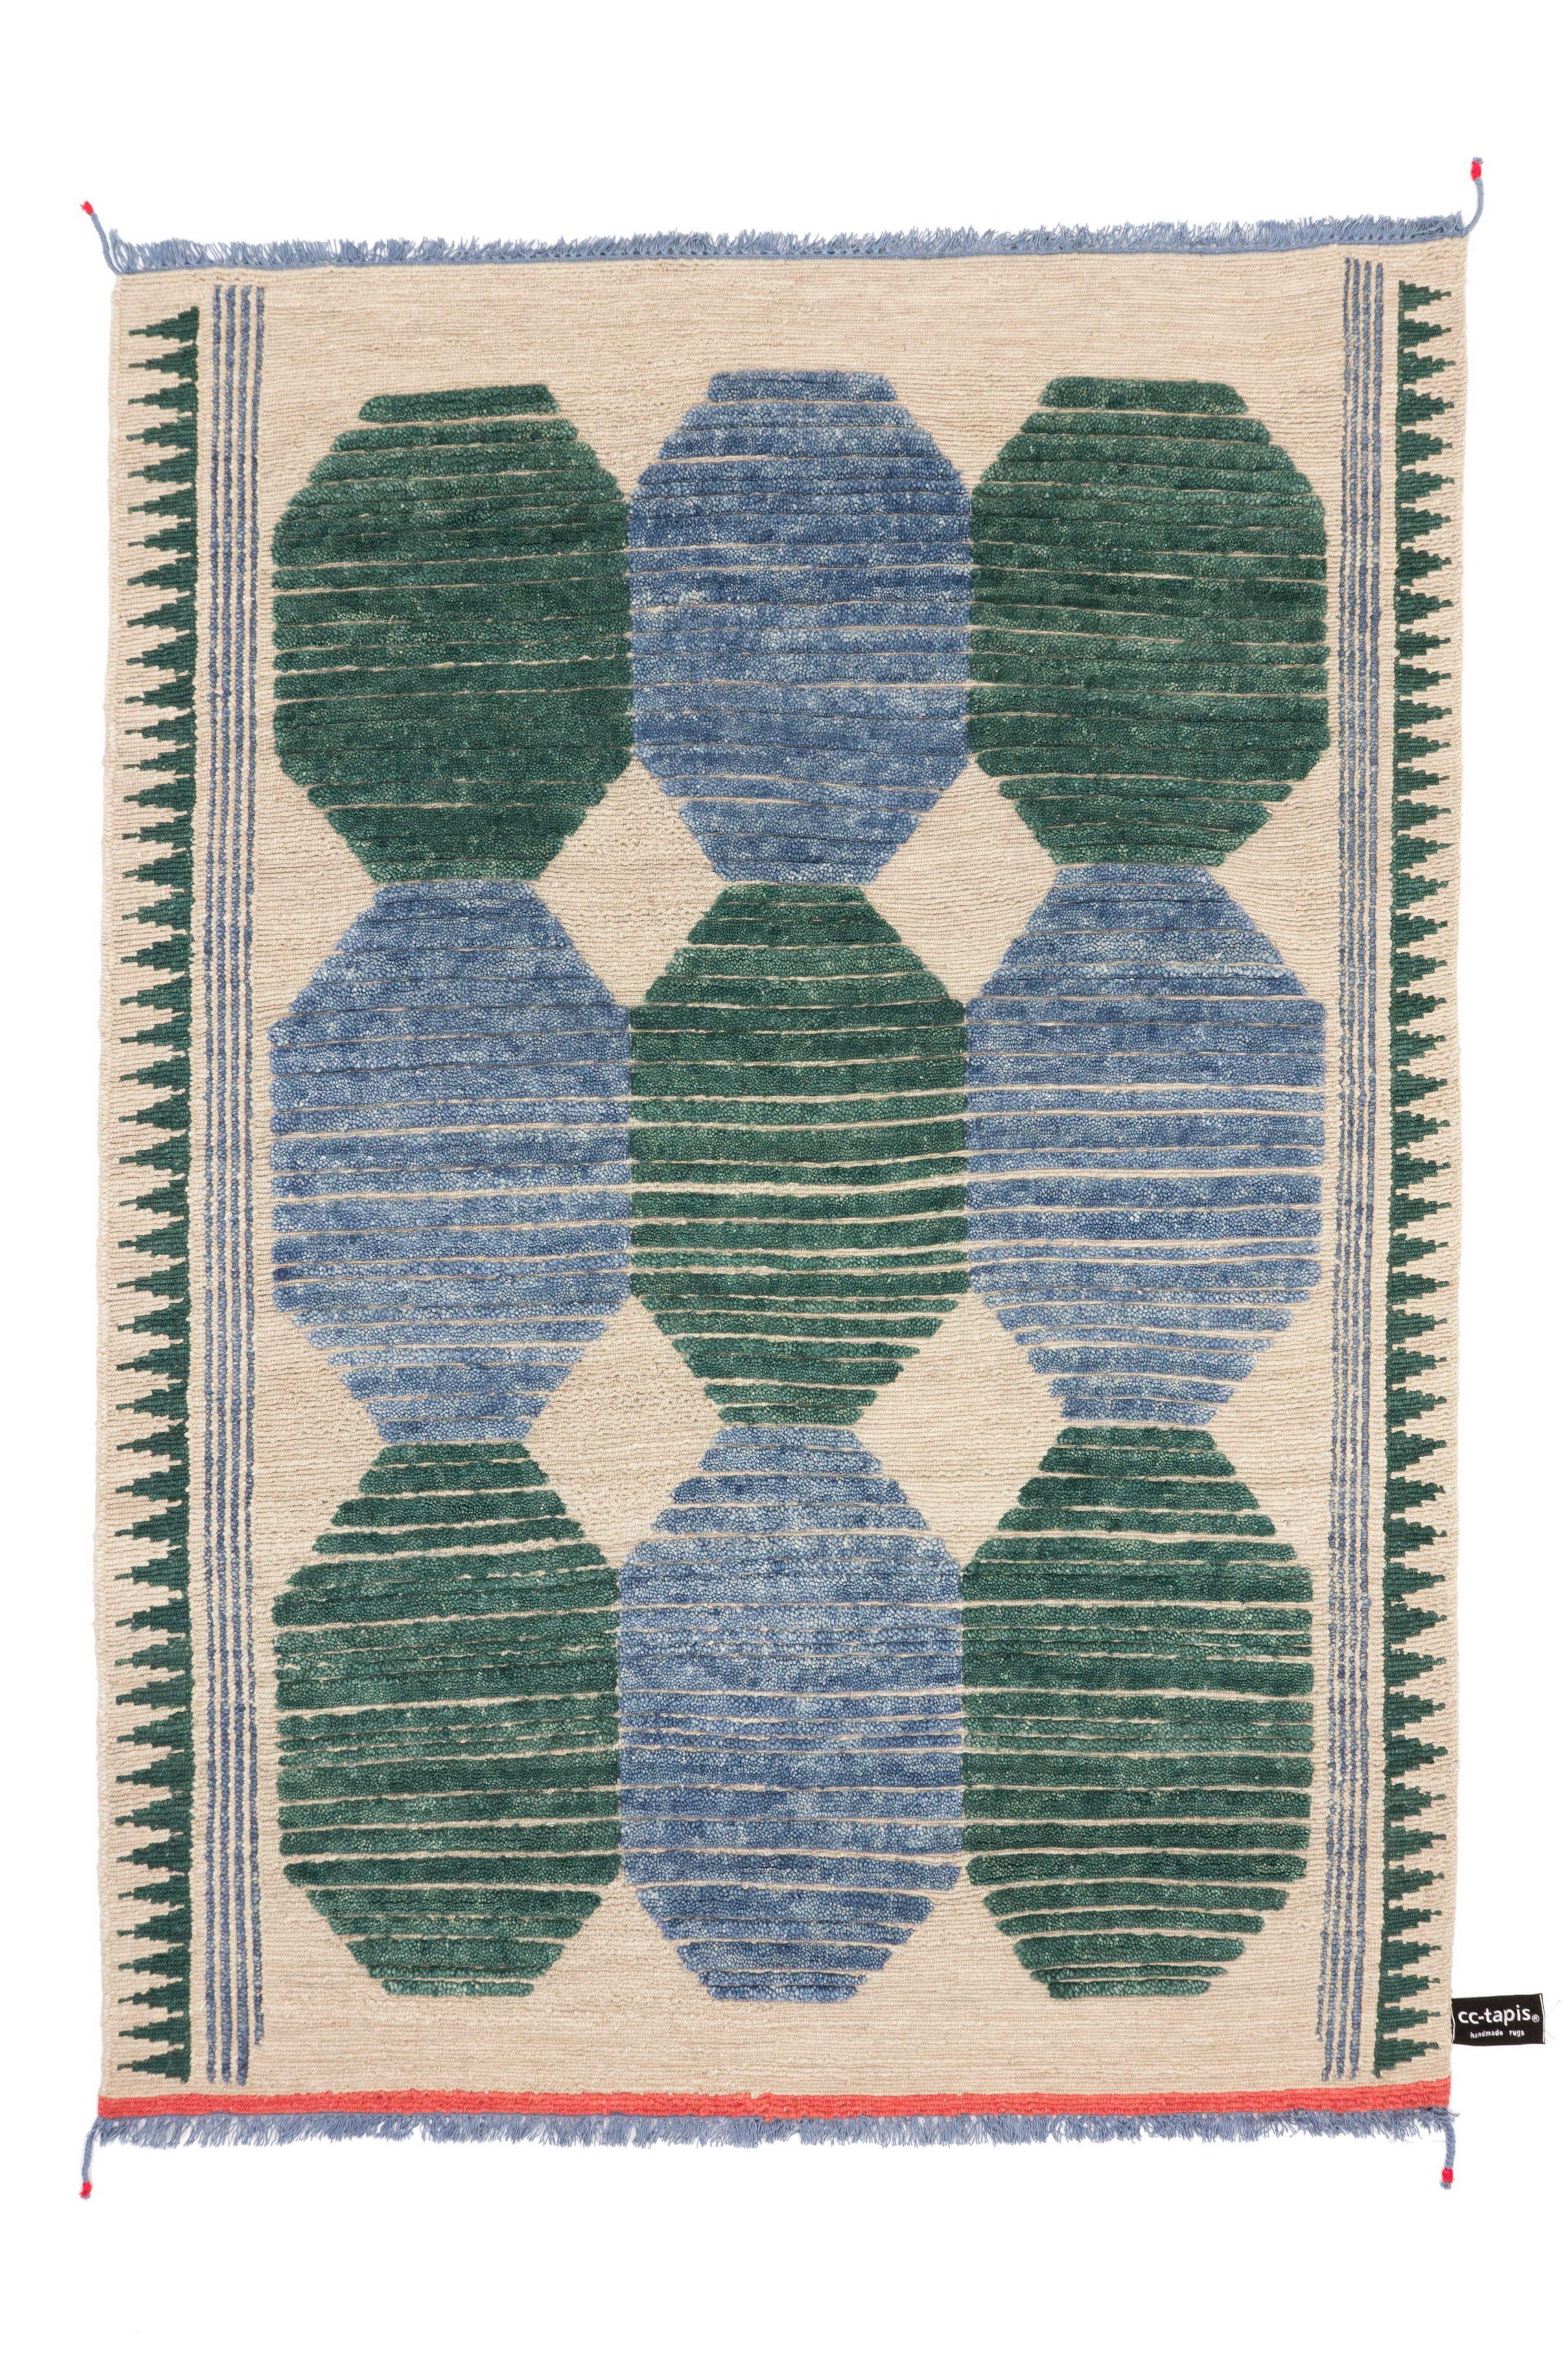 Handgearbeiteter rechteckiger Teppich PRIMITIVE WEAVE 3